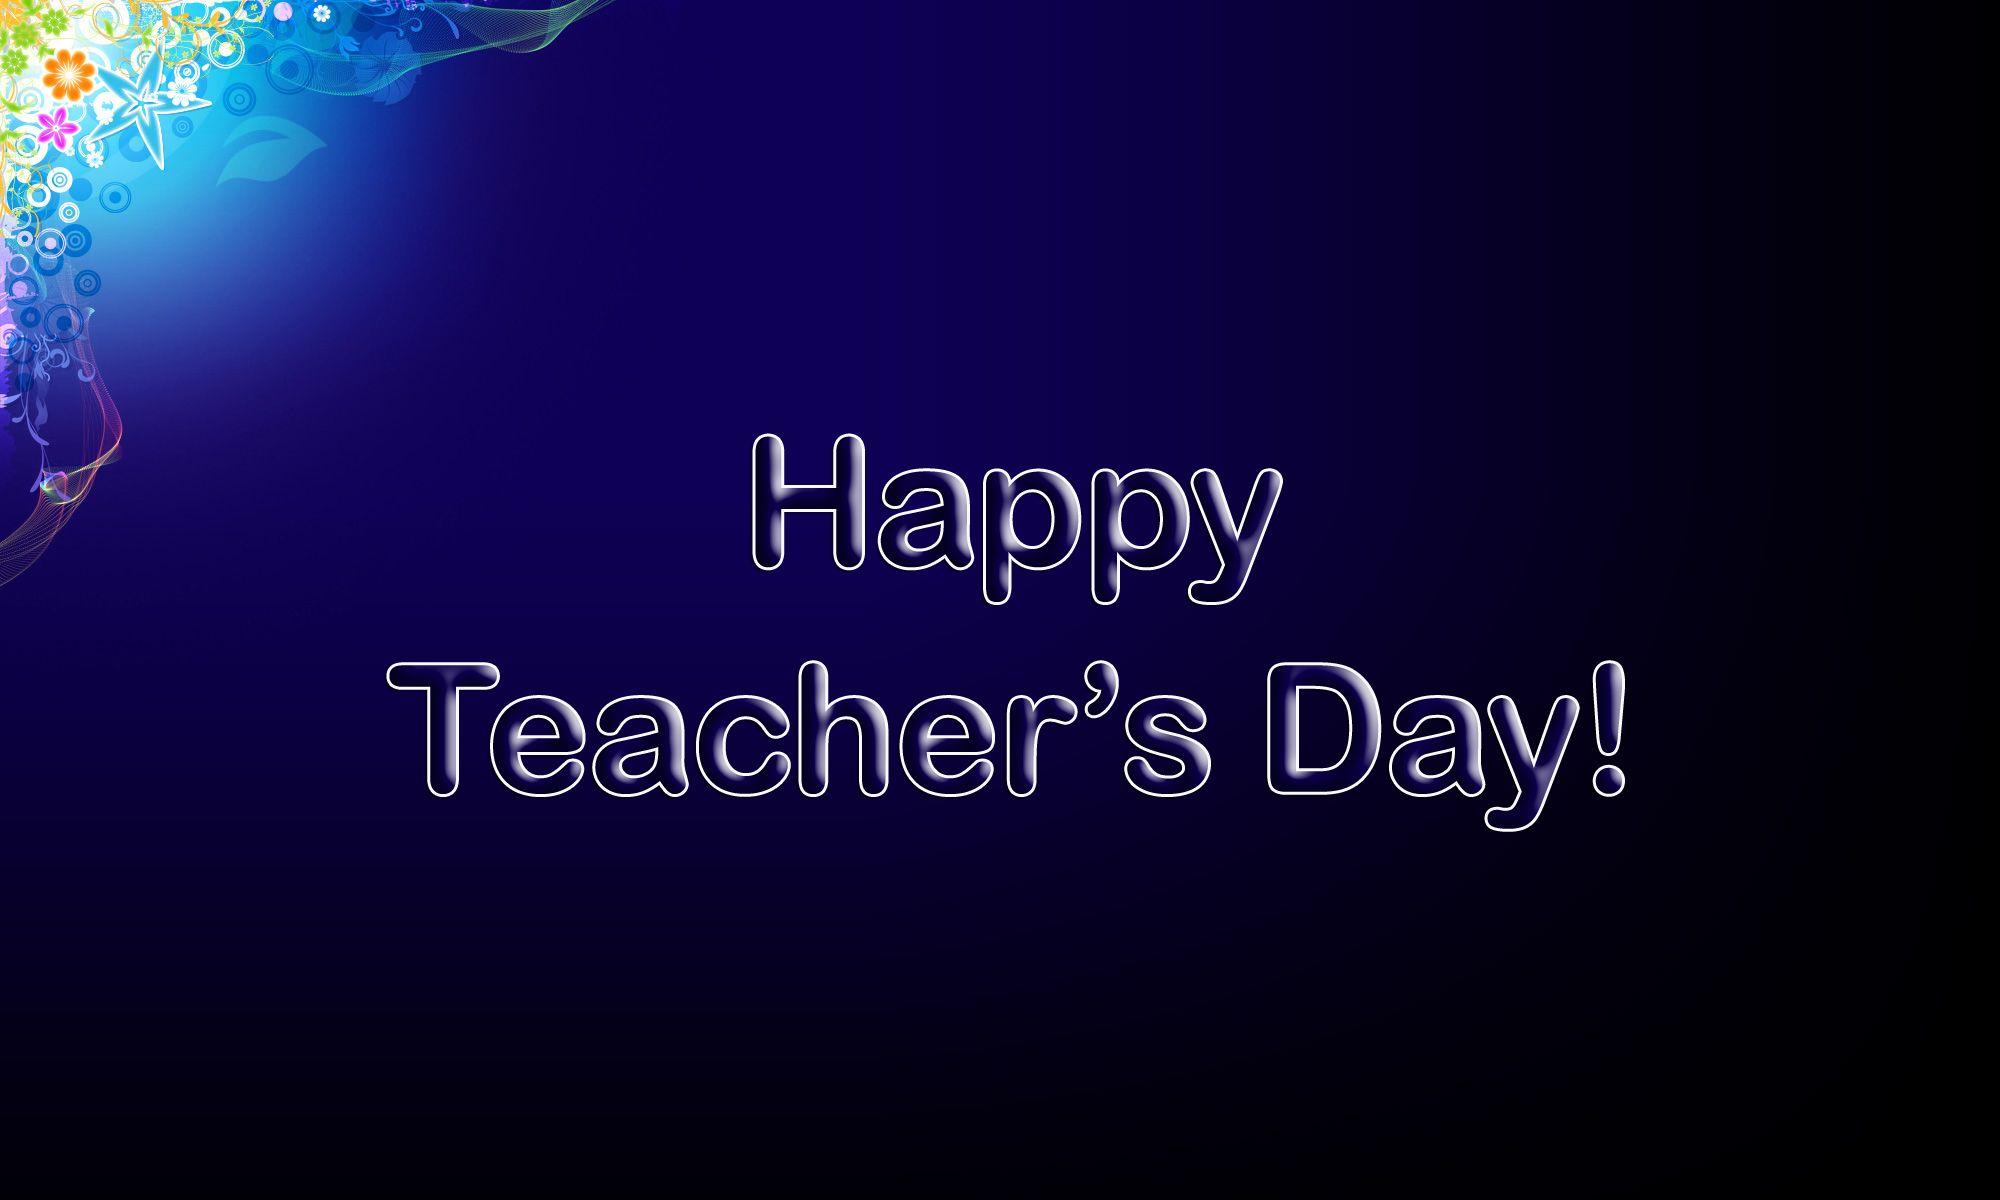 happy teachers day wallpapershappy teachers day wisheshappy teachers day quoteshappy